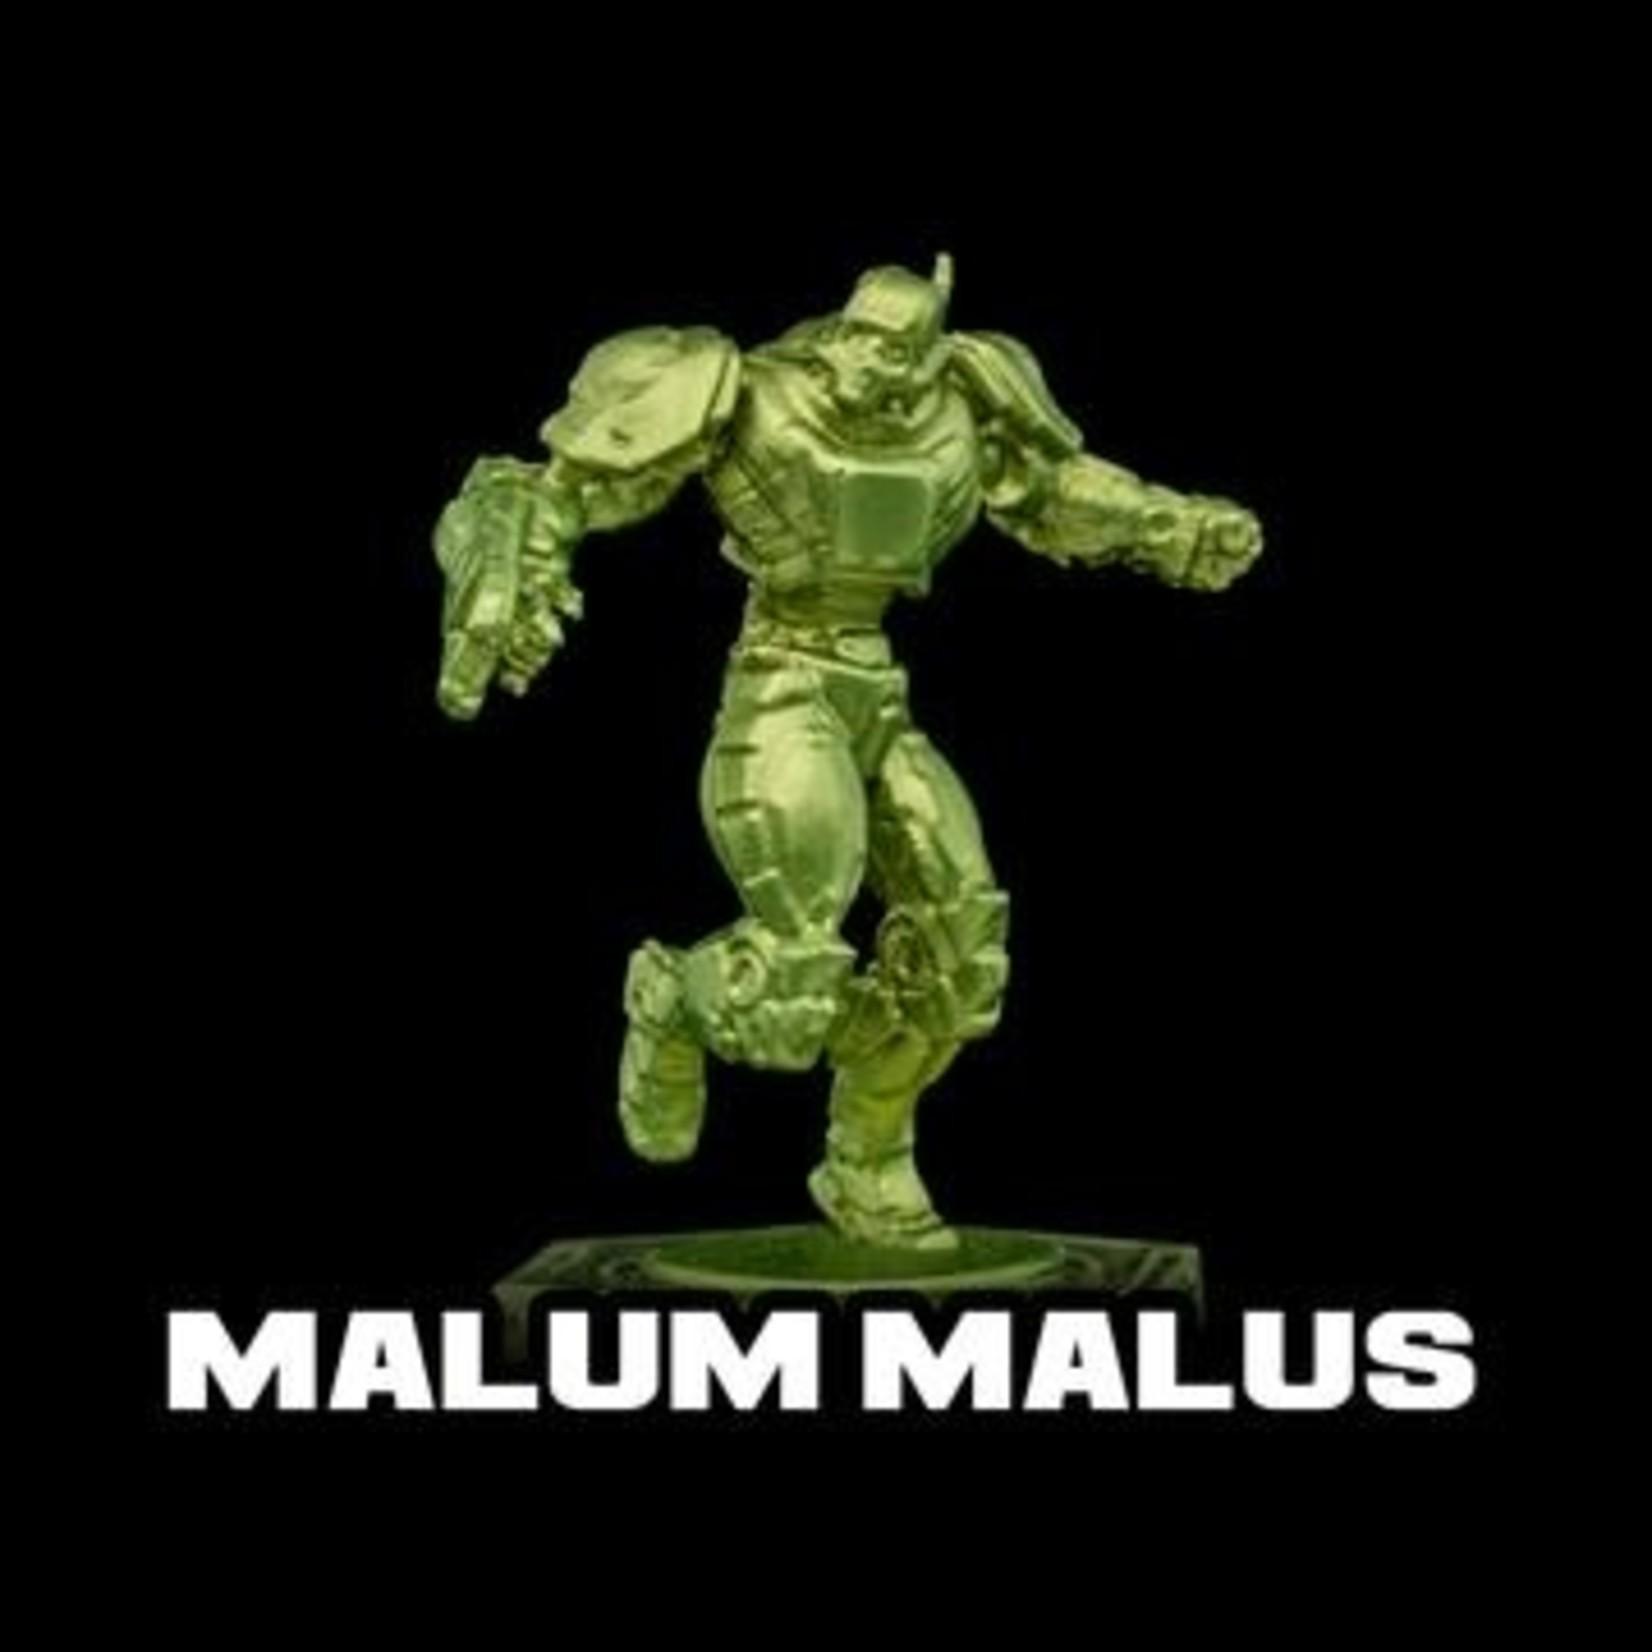 Turbo Dork Malum Malus (Metallic)